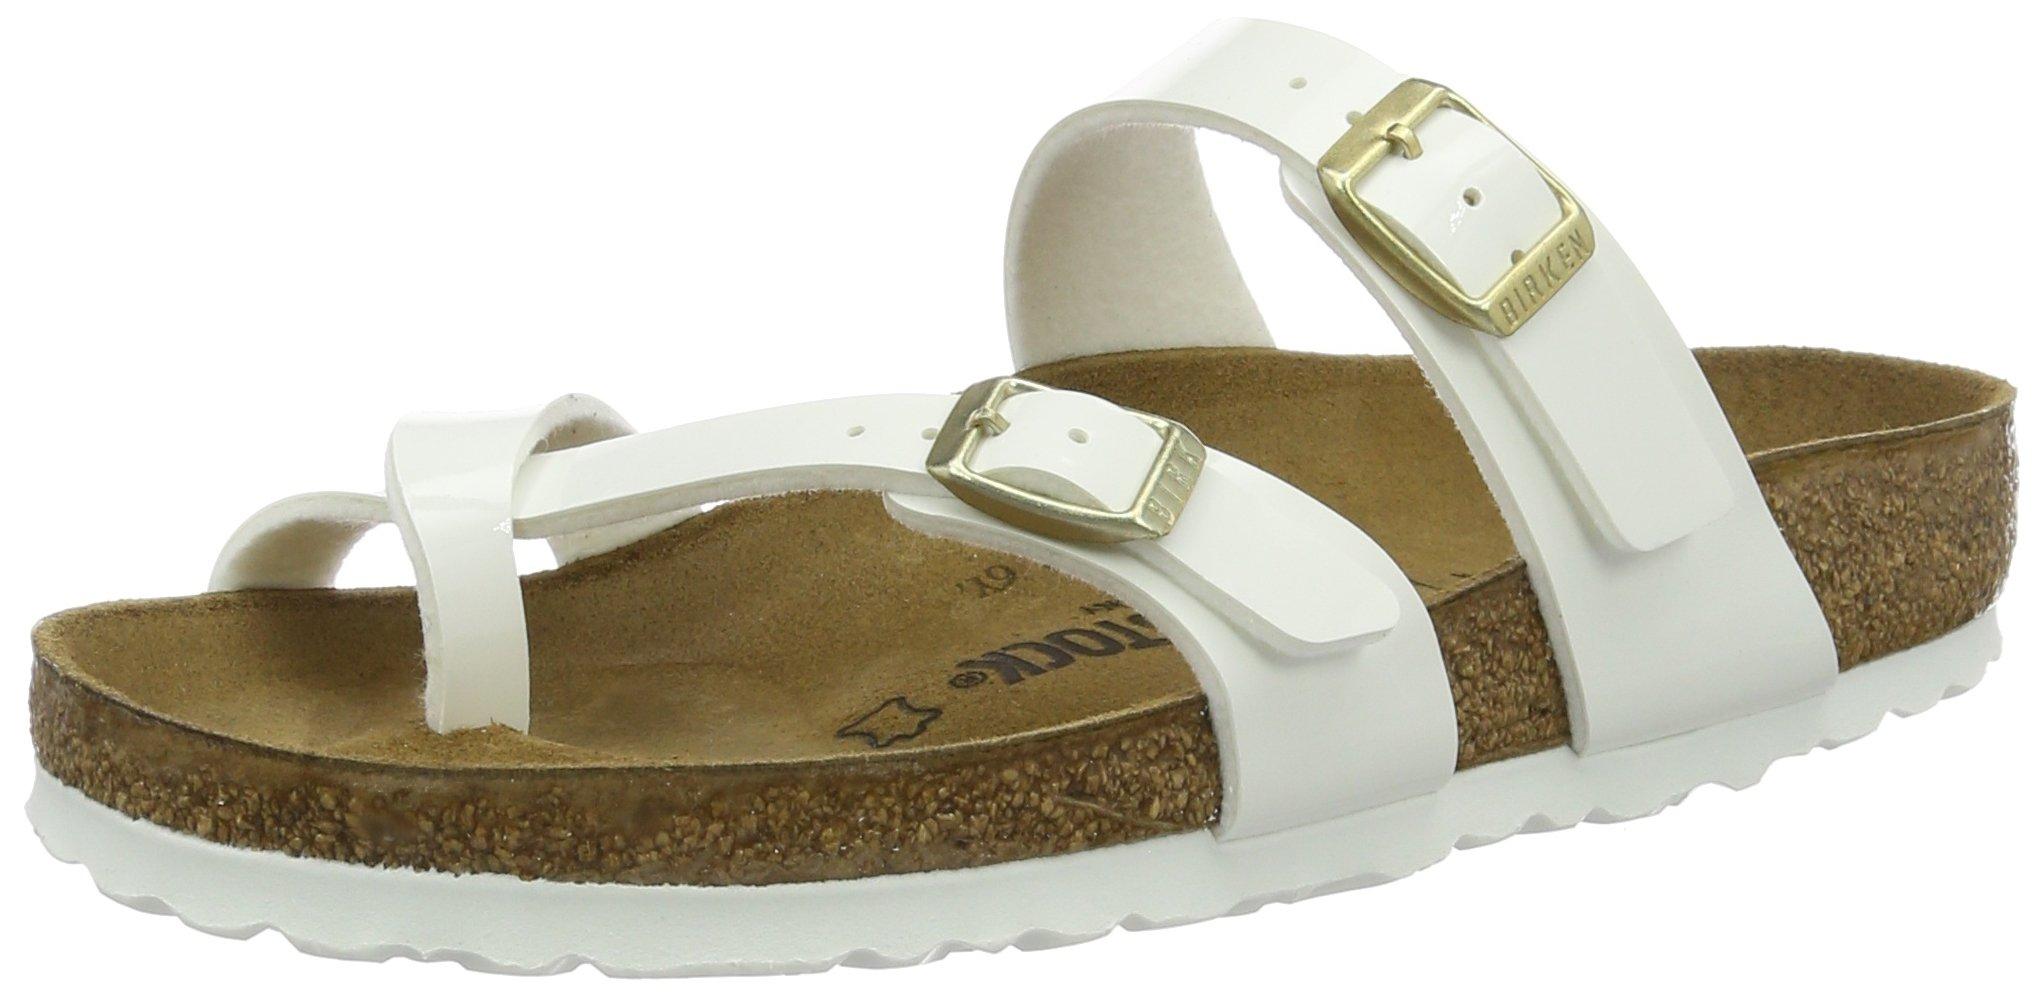 Birkenstock Womens Mayari Strappy Birko-Flor Twin Buckle Patent Sandals - White - US10/EU41